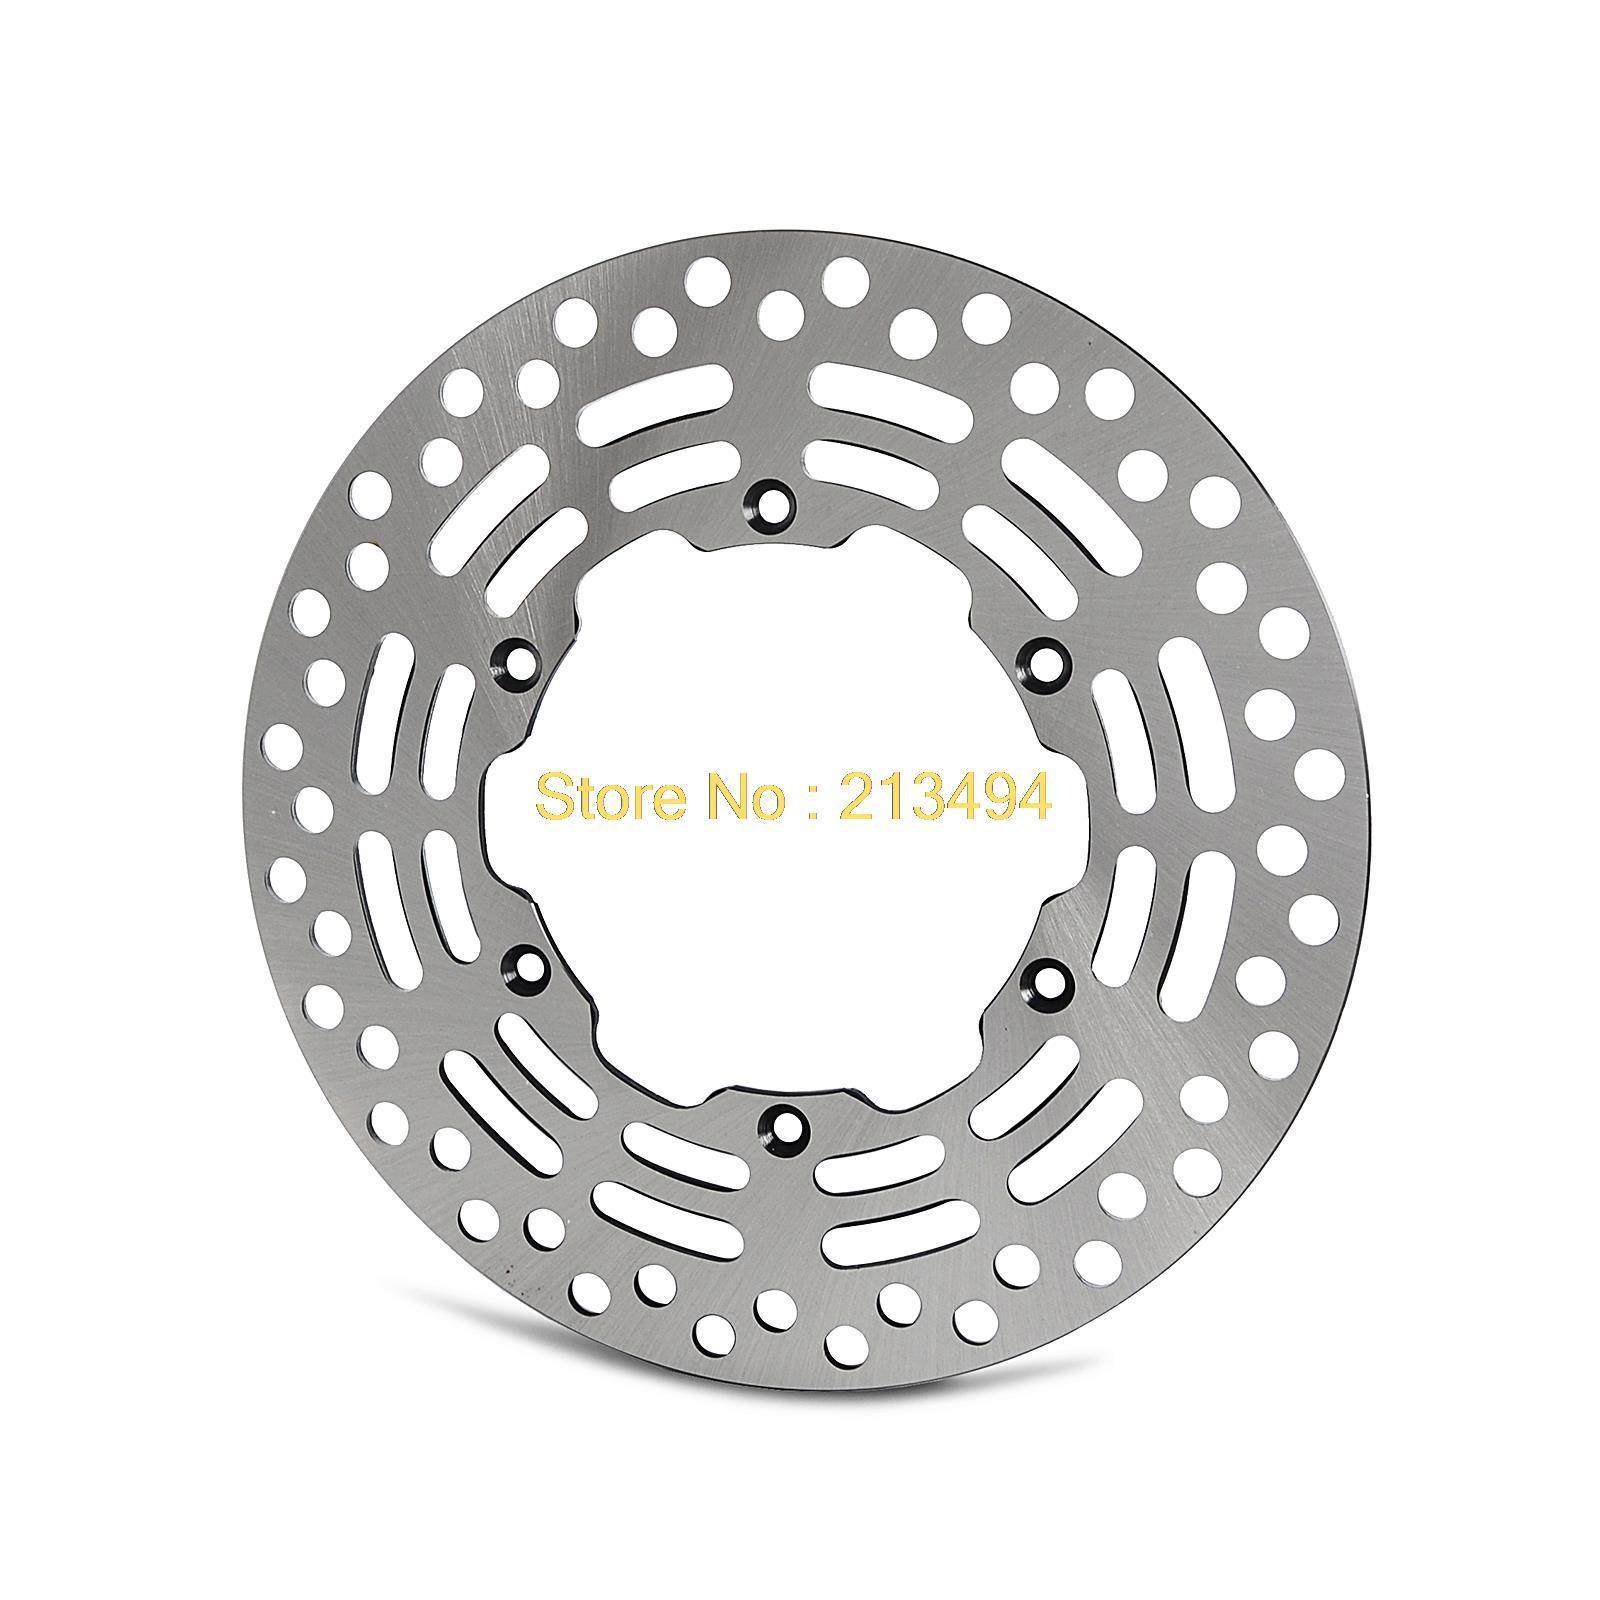 New Motorcycle Front Rotor Brake Disc For Suzuki RM 125 250 RMX 250 Kawasaki 400cc KLX